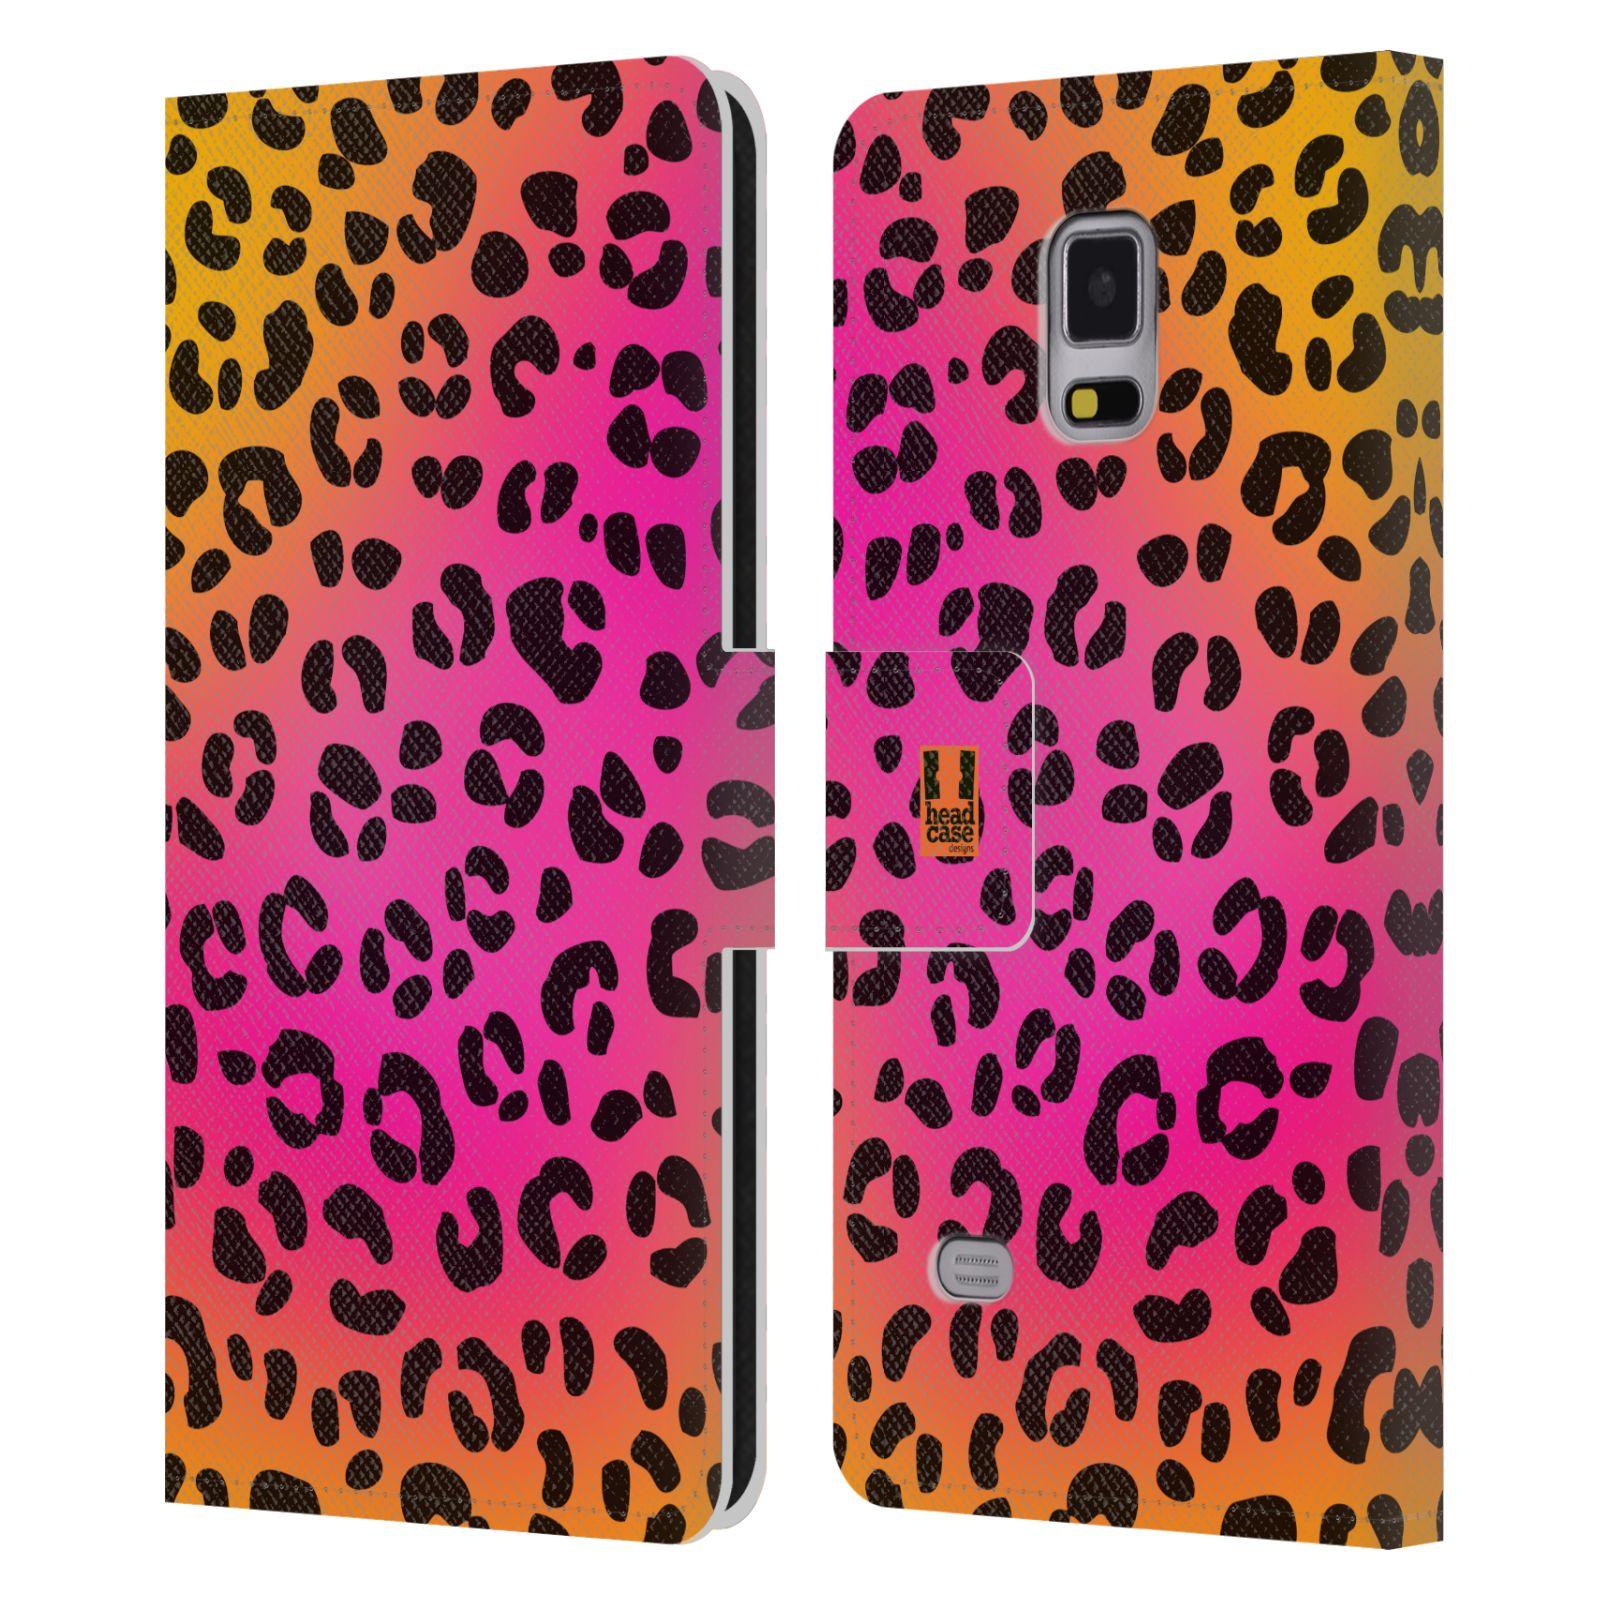 HEAD CASE Flipové pouzdro pro mobil Samsung Galaxy Note 4 Zvířecí barevné vzory růžový leopard